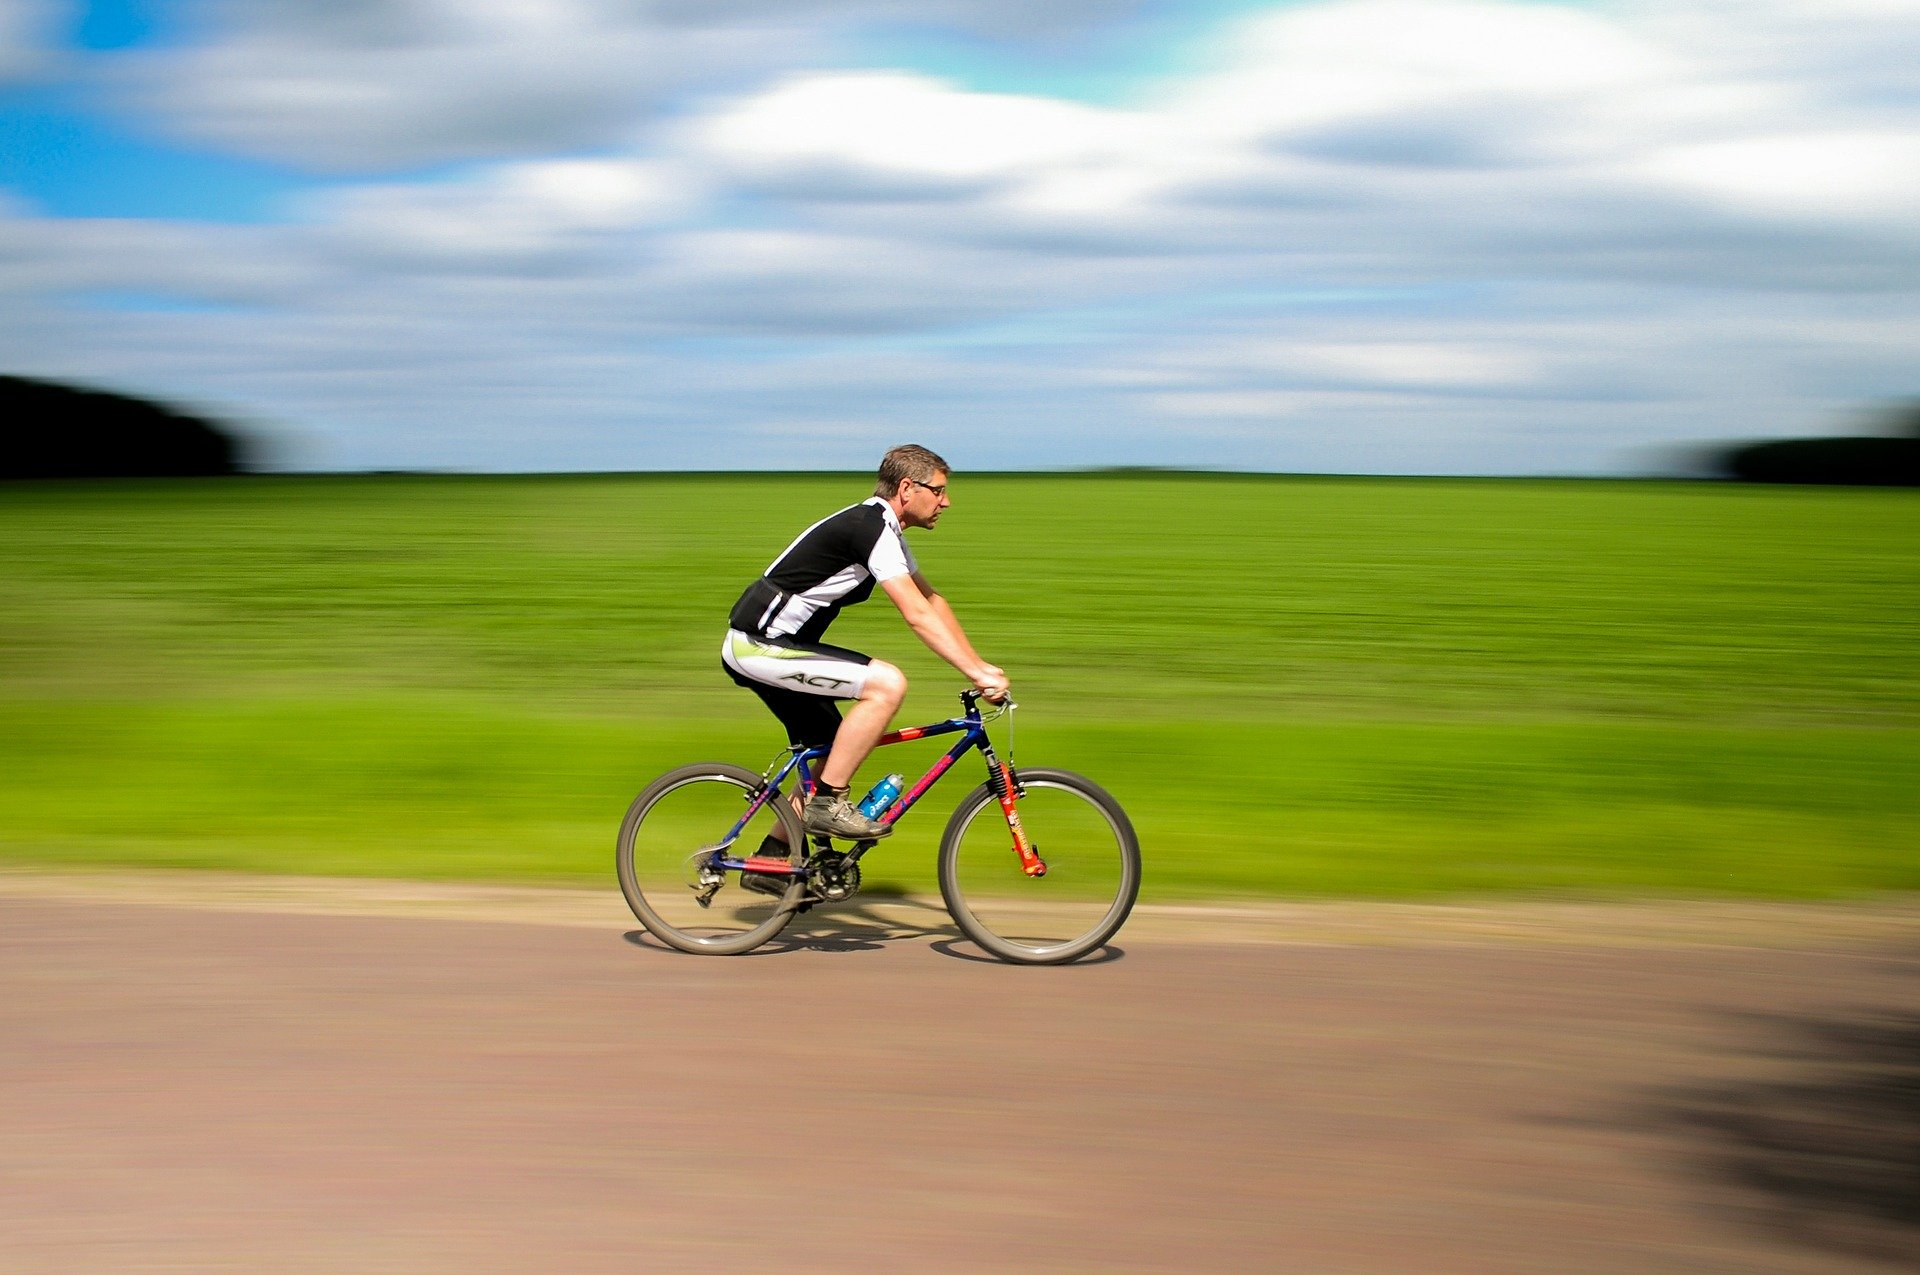 Cyklende mand